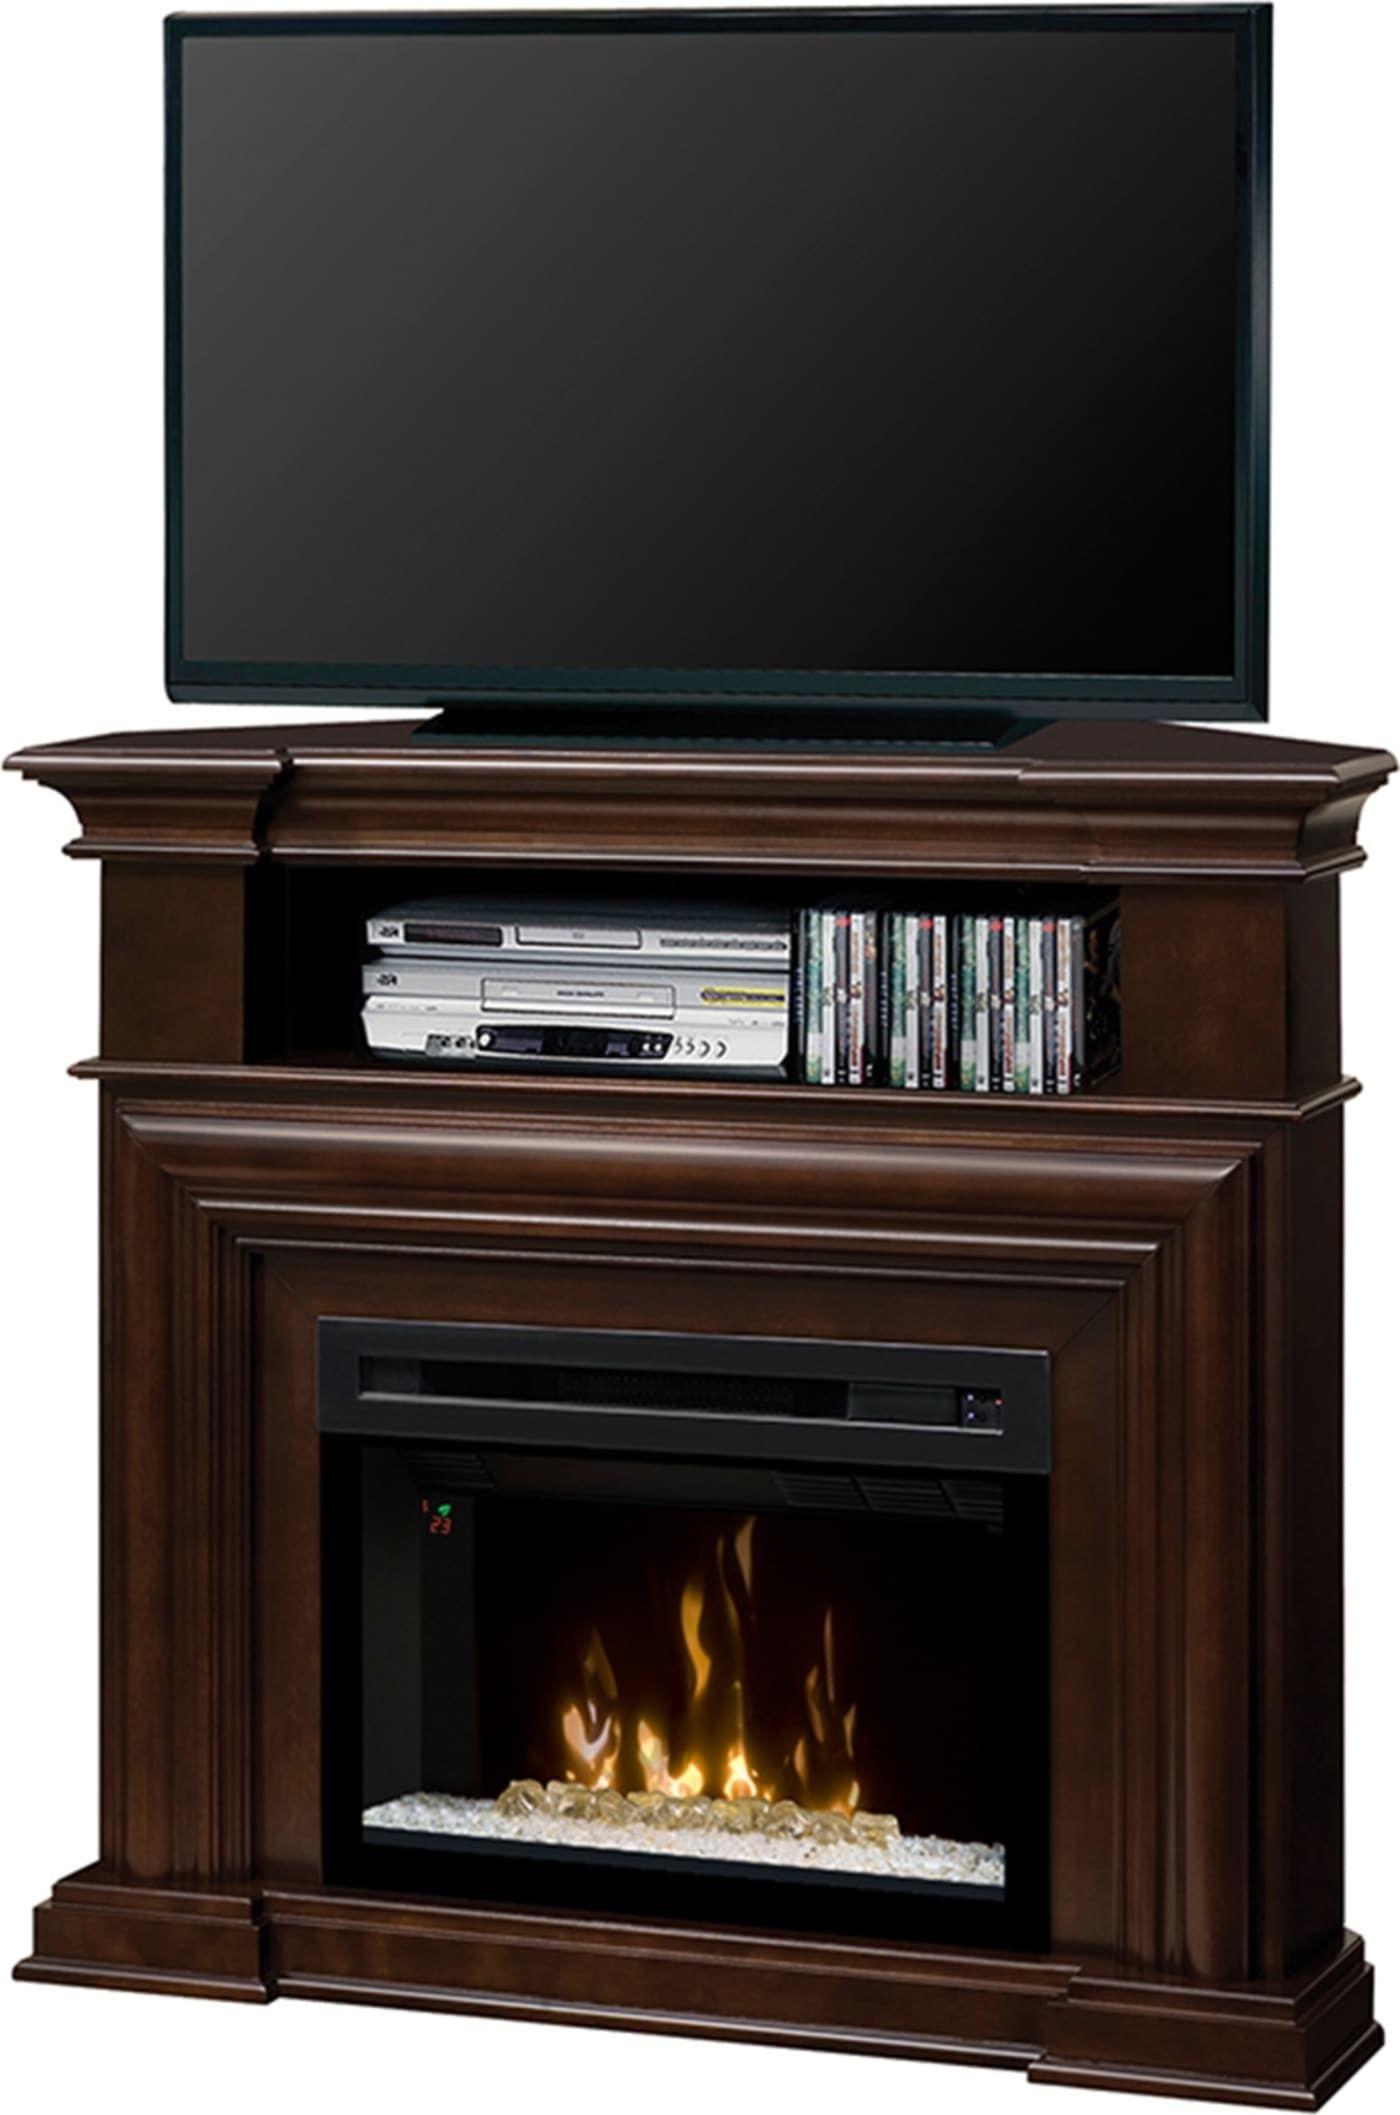 dimplex fireplace entertainment center on dimplex gds25hg 1057e fireplace console fireplace media console dimplex fireplace pinterest